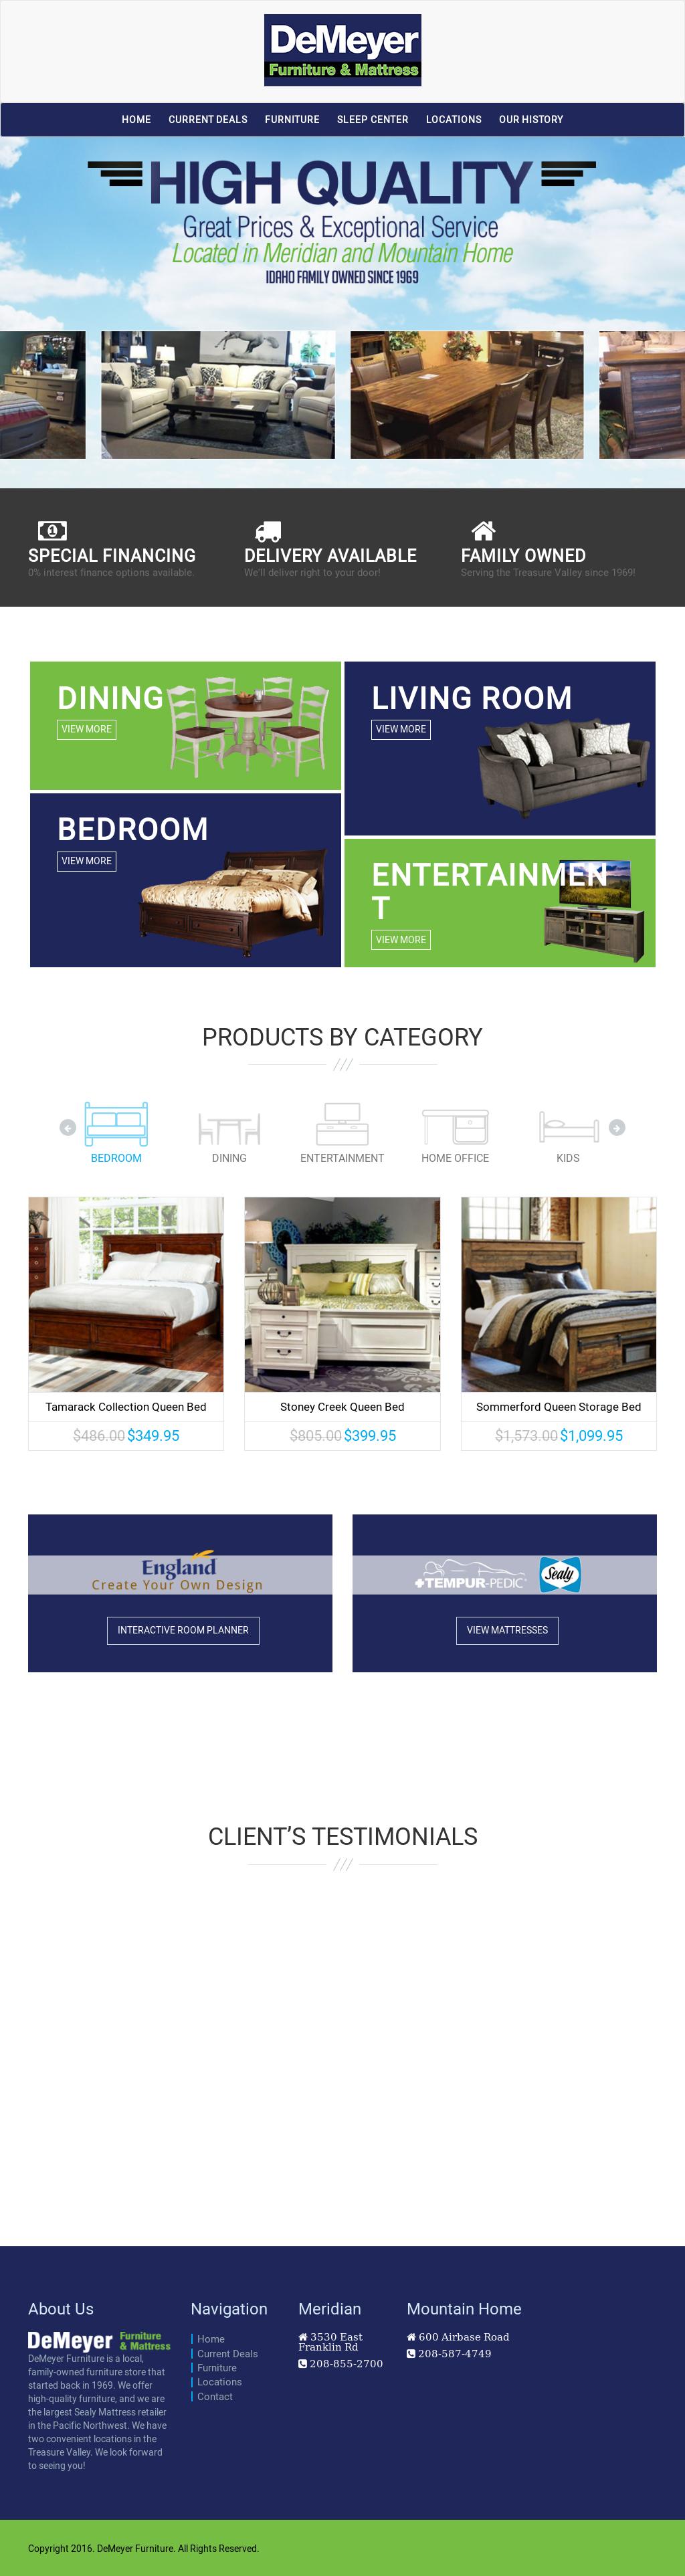 Demeyer Furniture Website History